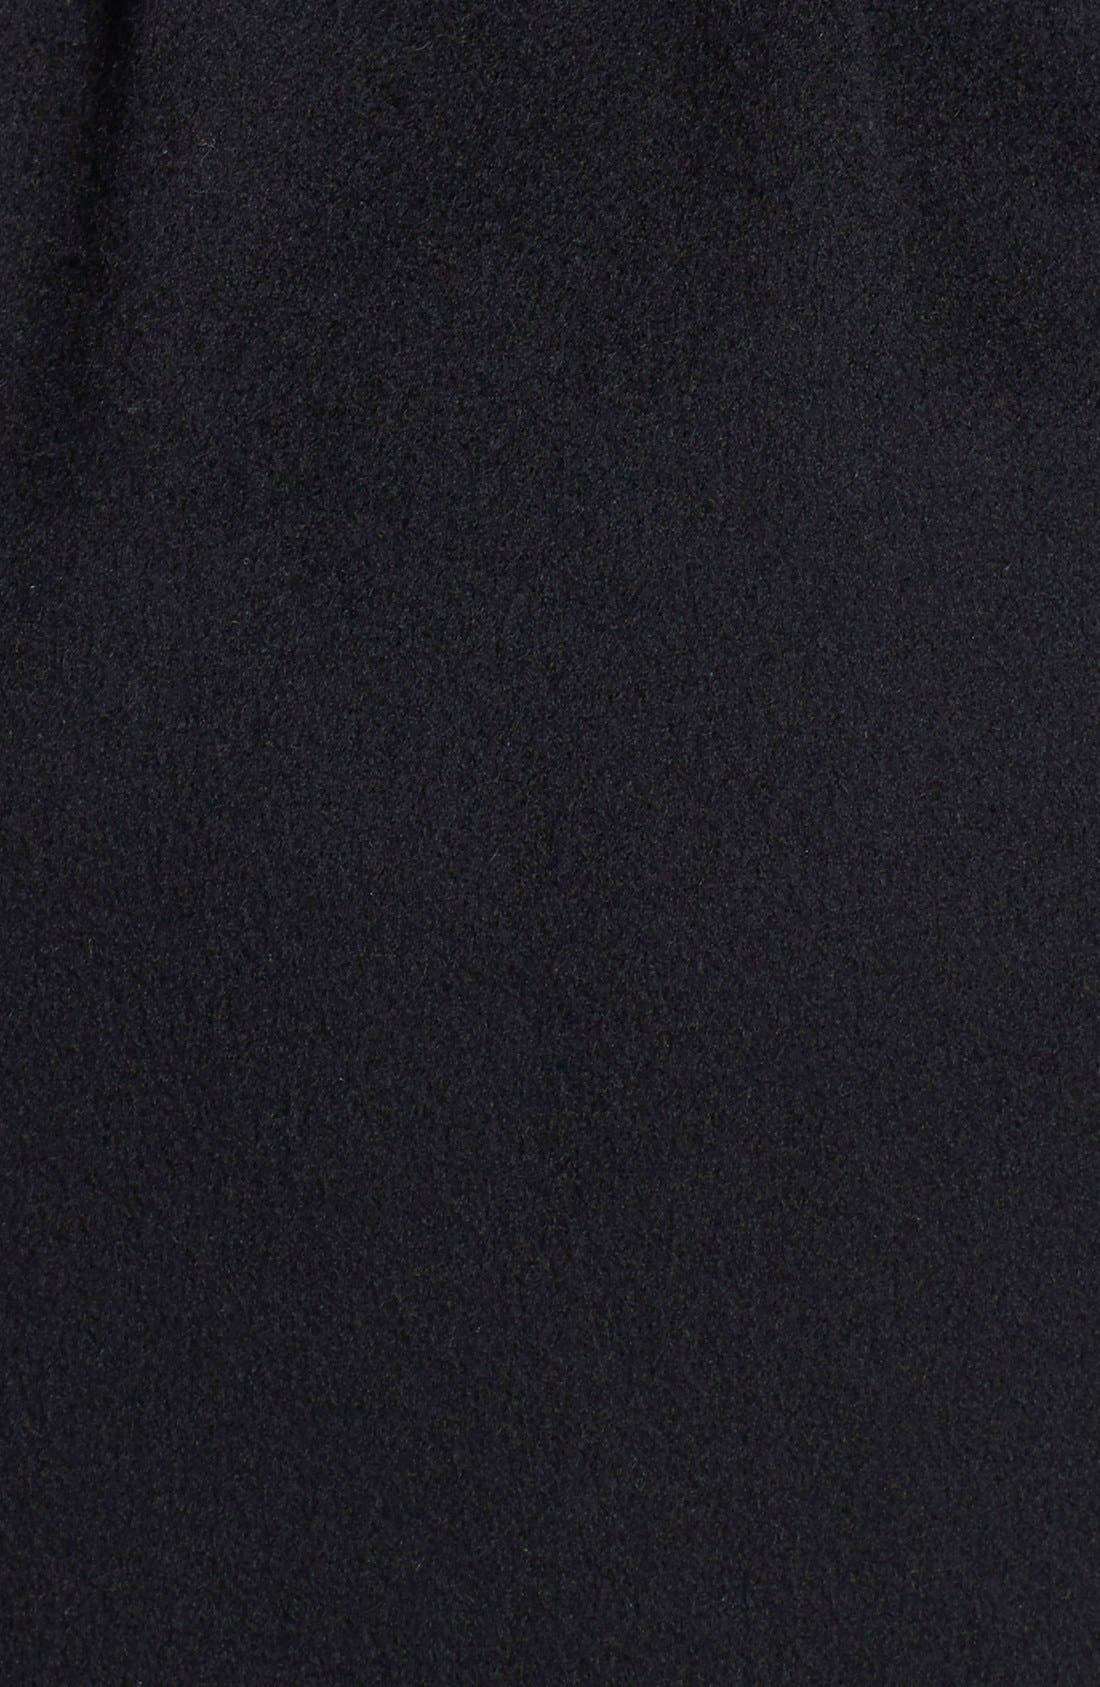 Alternate Image 3  - Fleurette Wool Wrap Coat with Genuine Fox Fur Collar